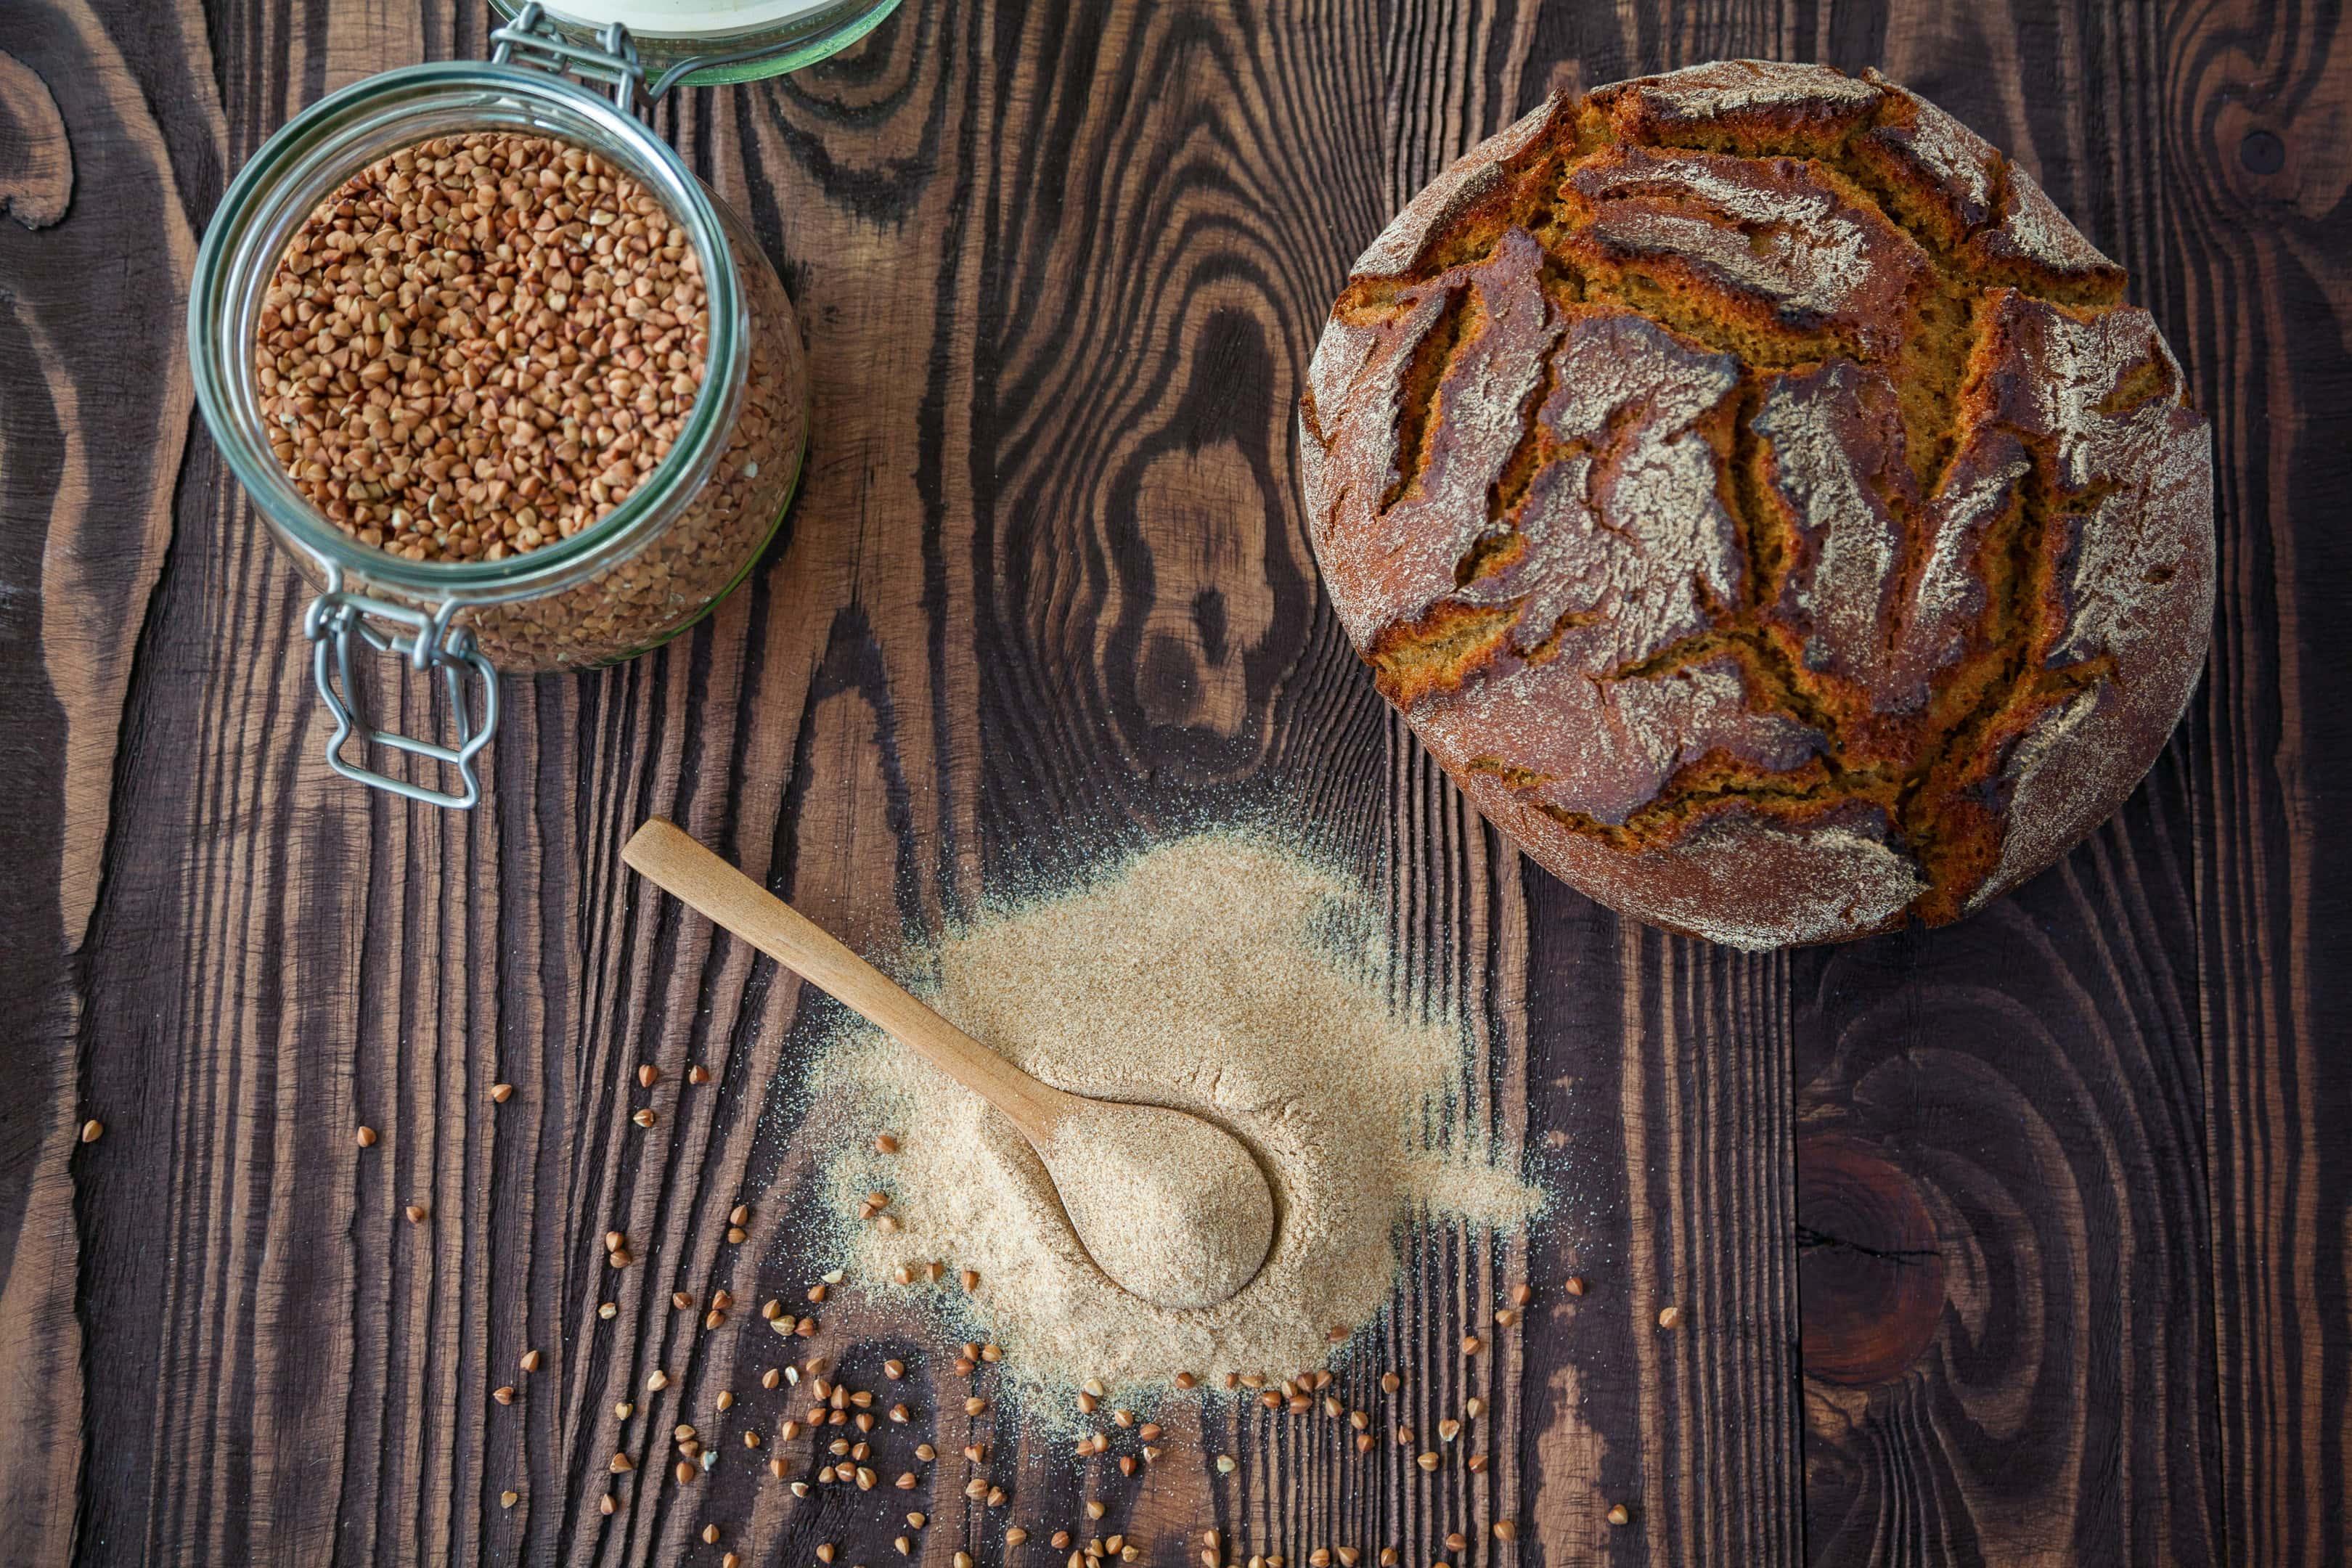 Buckwheat flour and buckwheat grains and buckwheat bread.